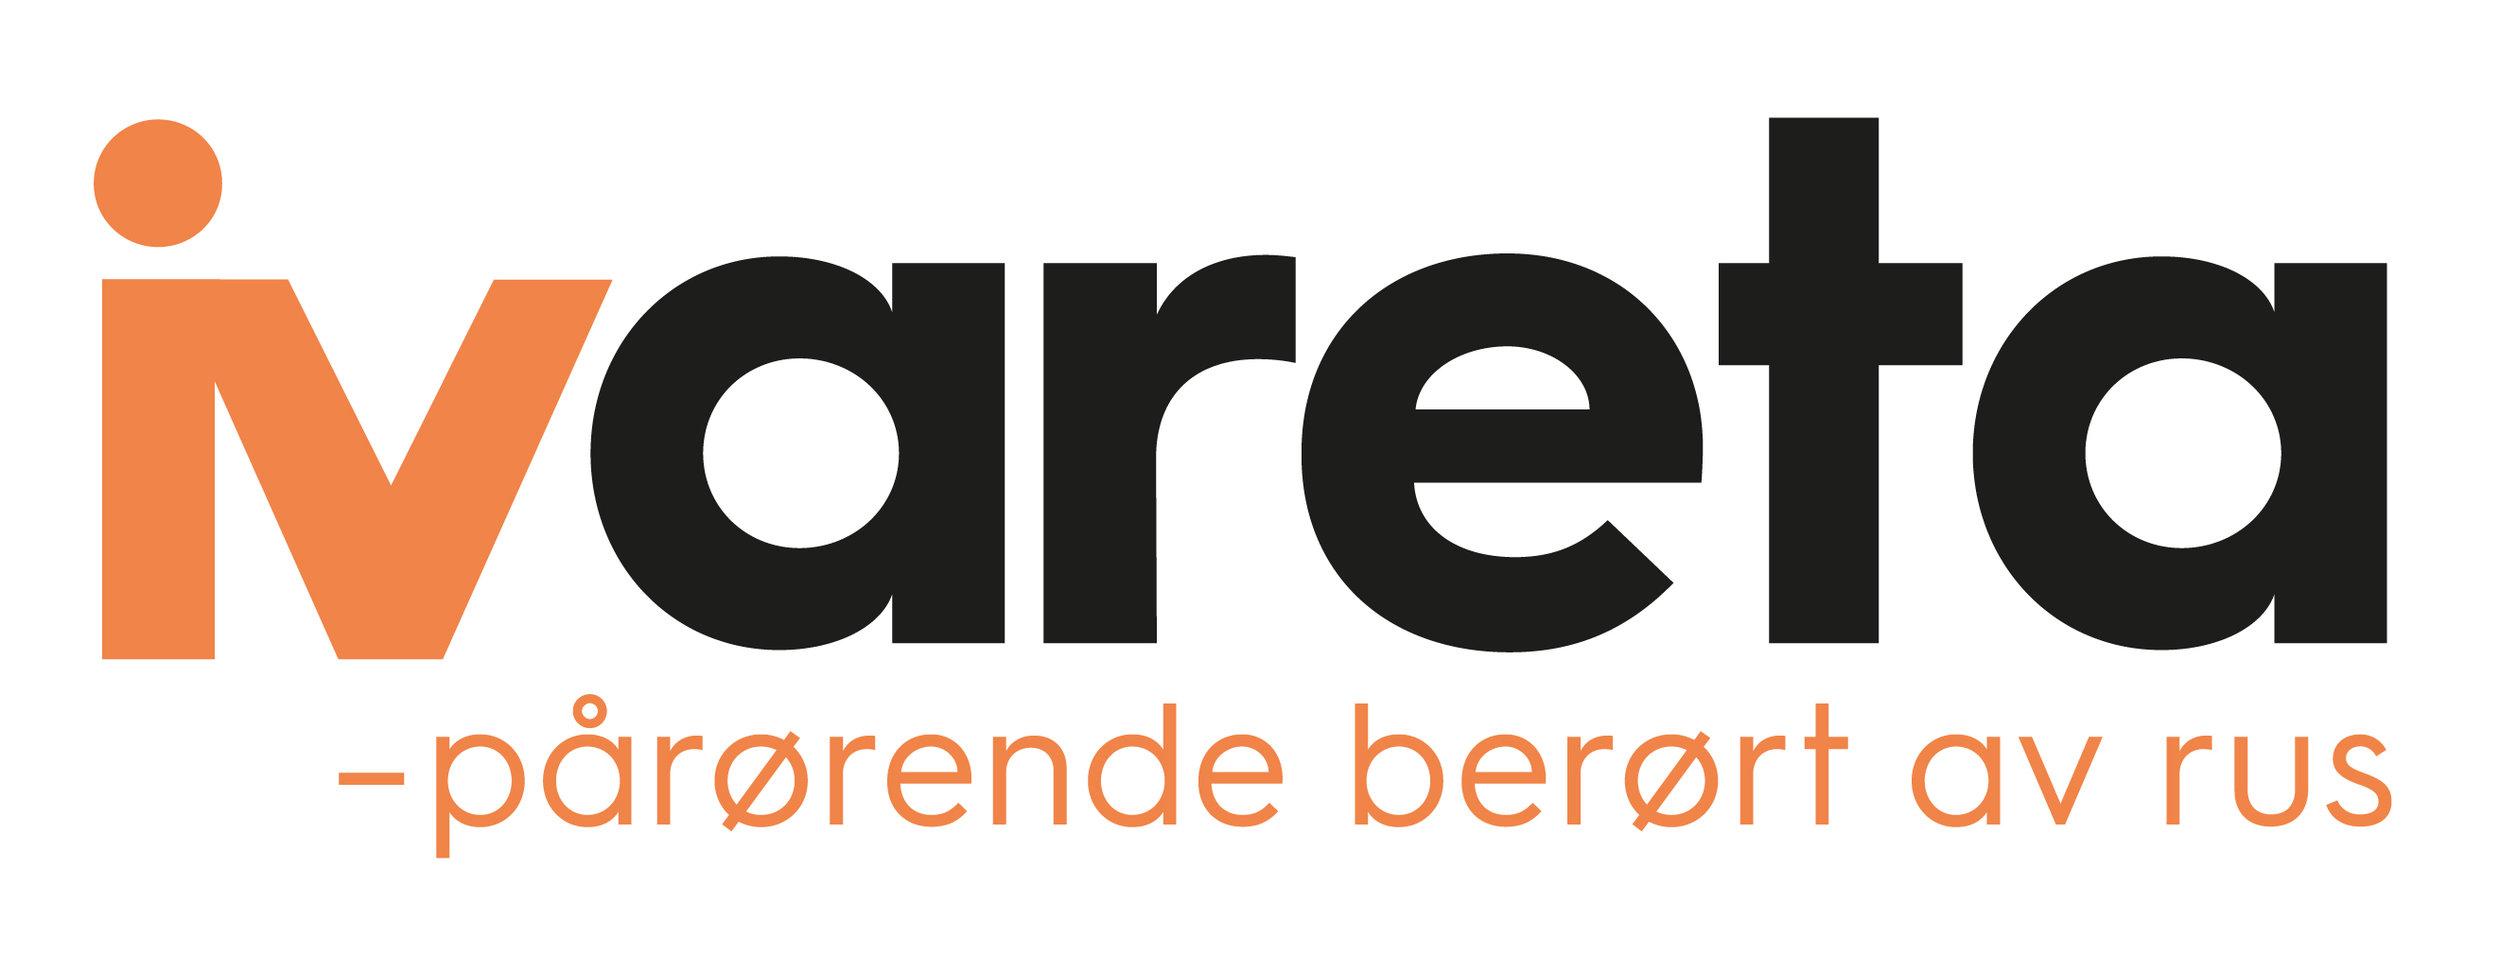 Ivareta-logo-orange.jpg